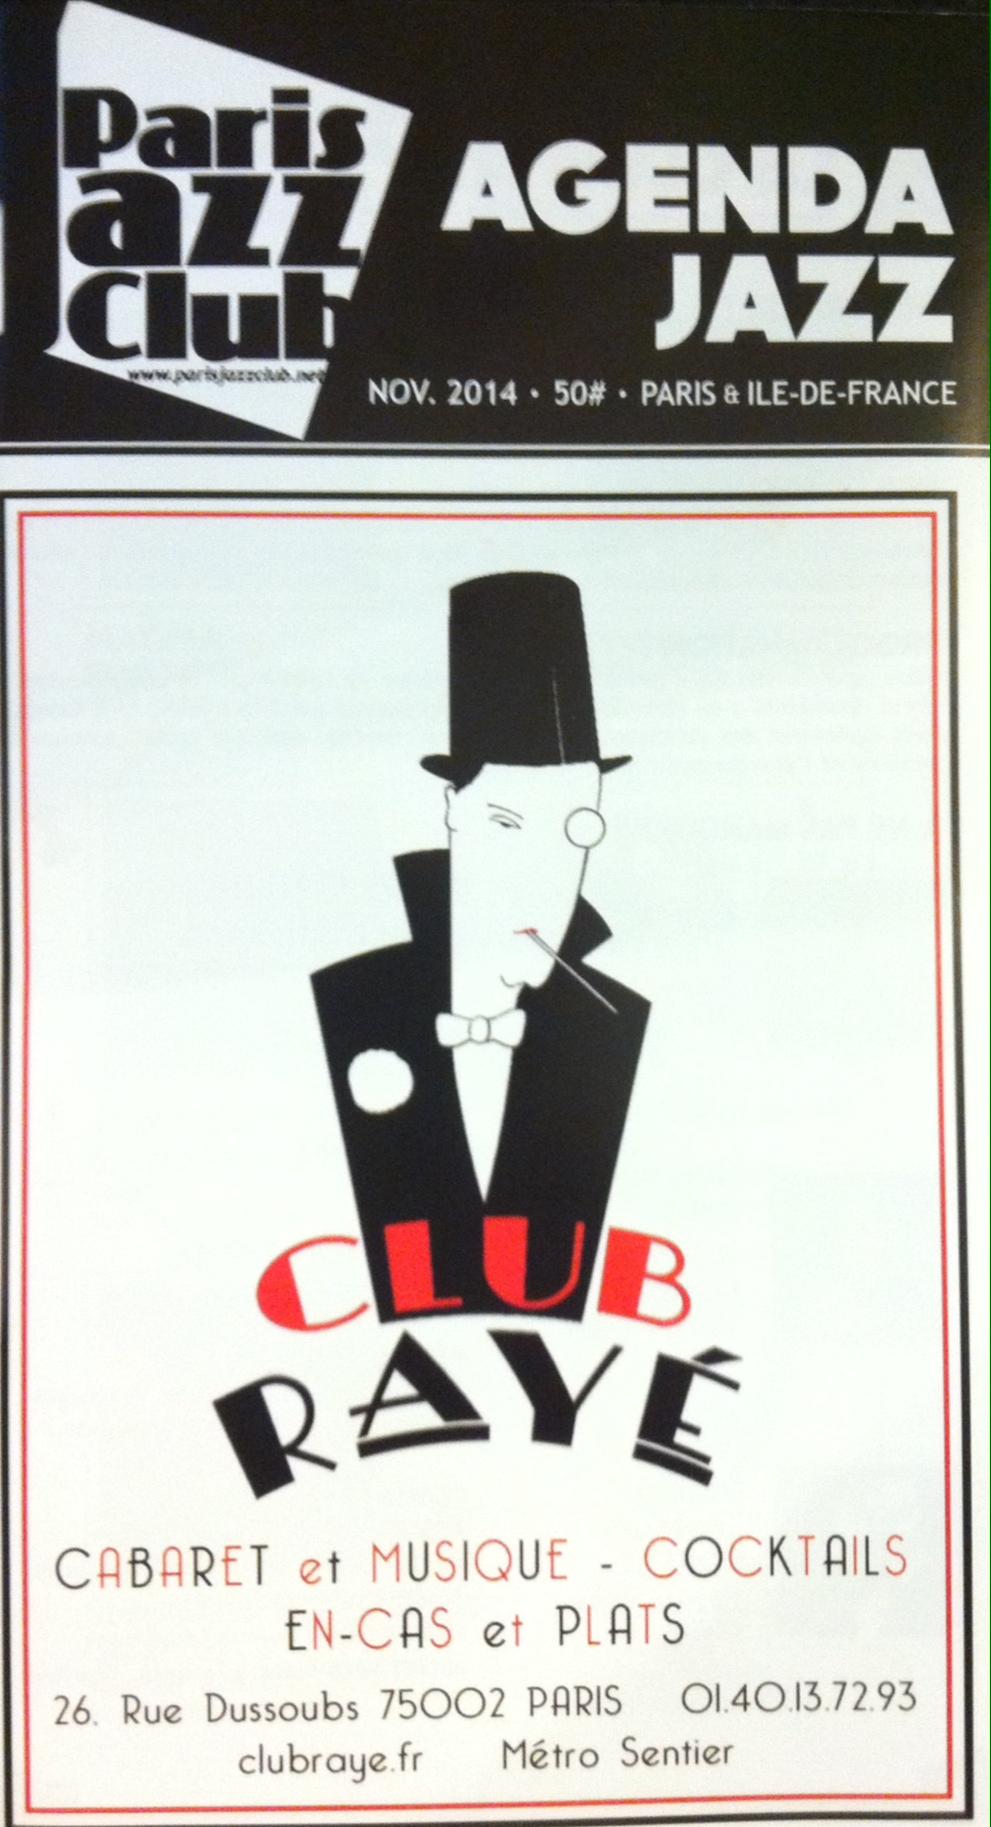 Paris Jazz Club magazine featuring Club RaYe